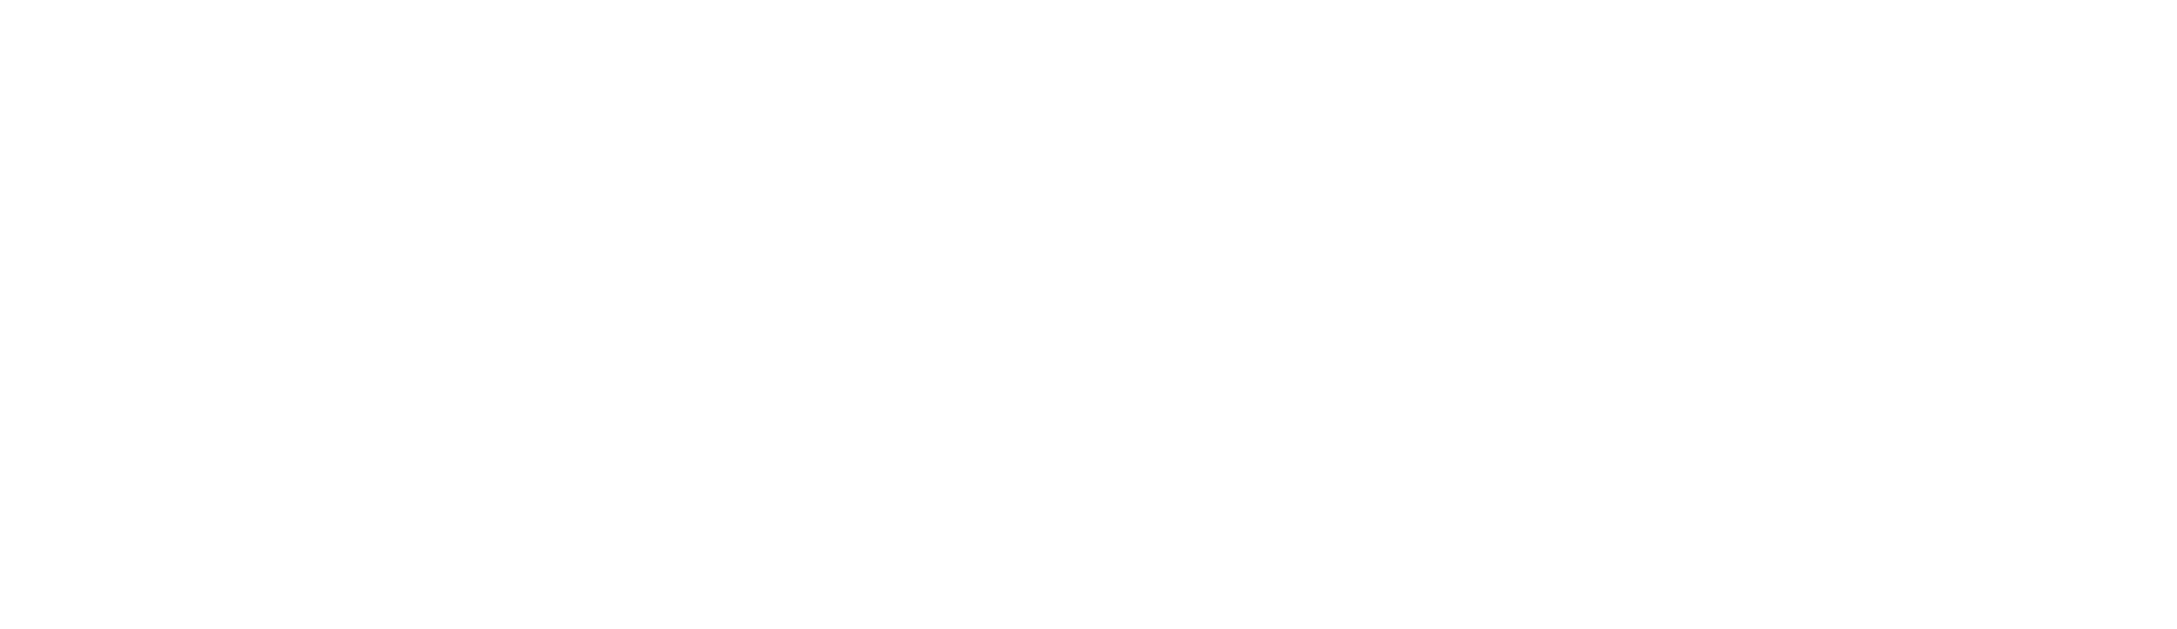 Map International Medicine For The World